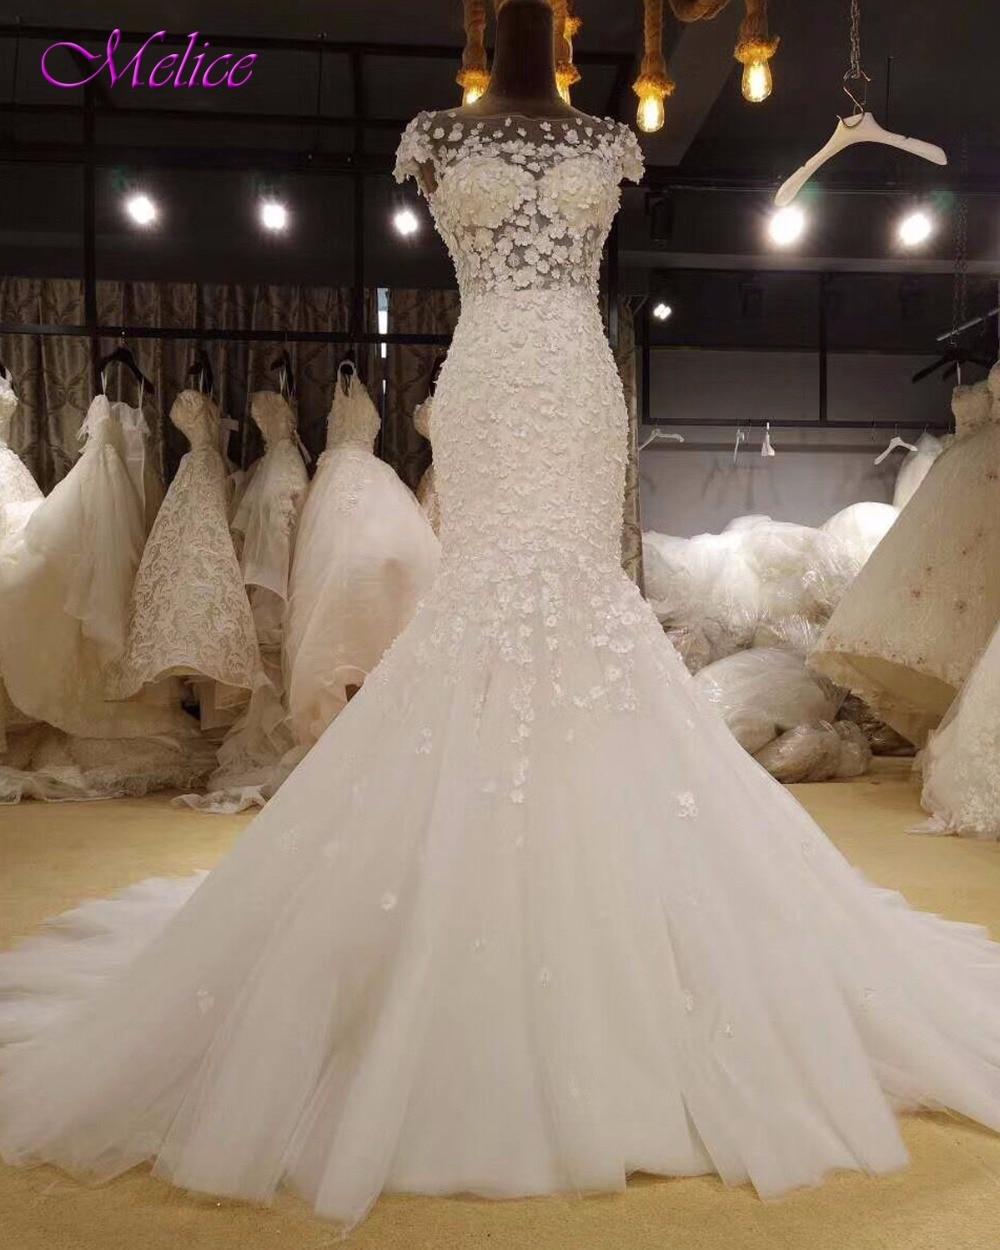 Vintage Wedding Dresses 2019: Fmogl Glamorous Appliques Cap Sleeve Mermaid Wedding Dress